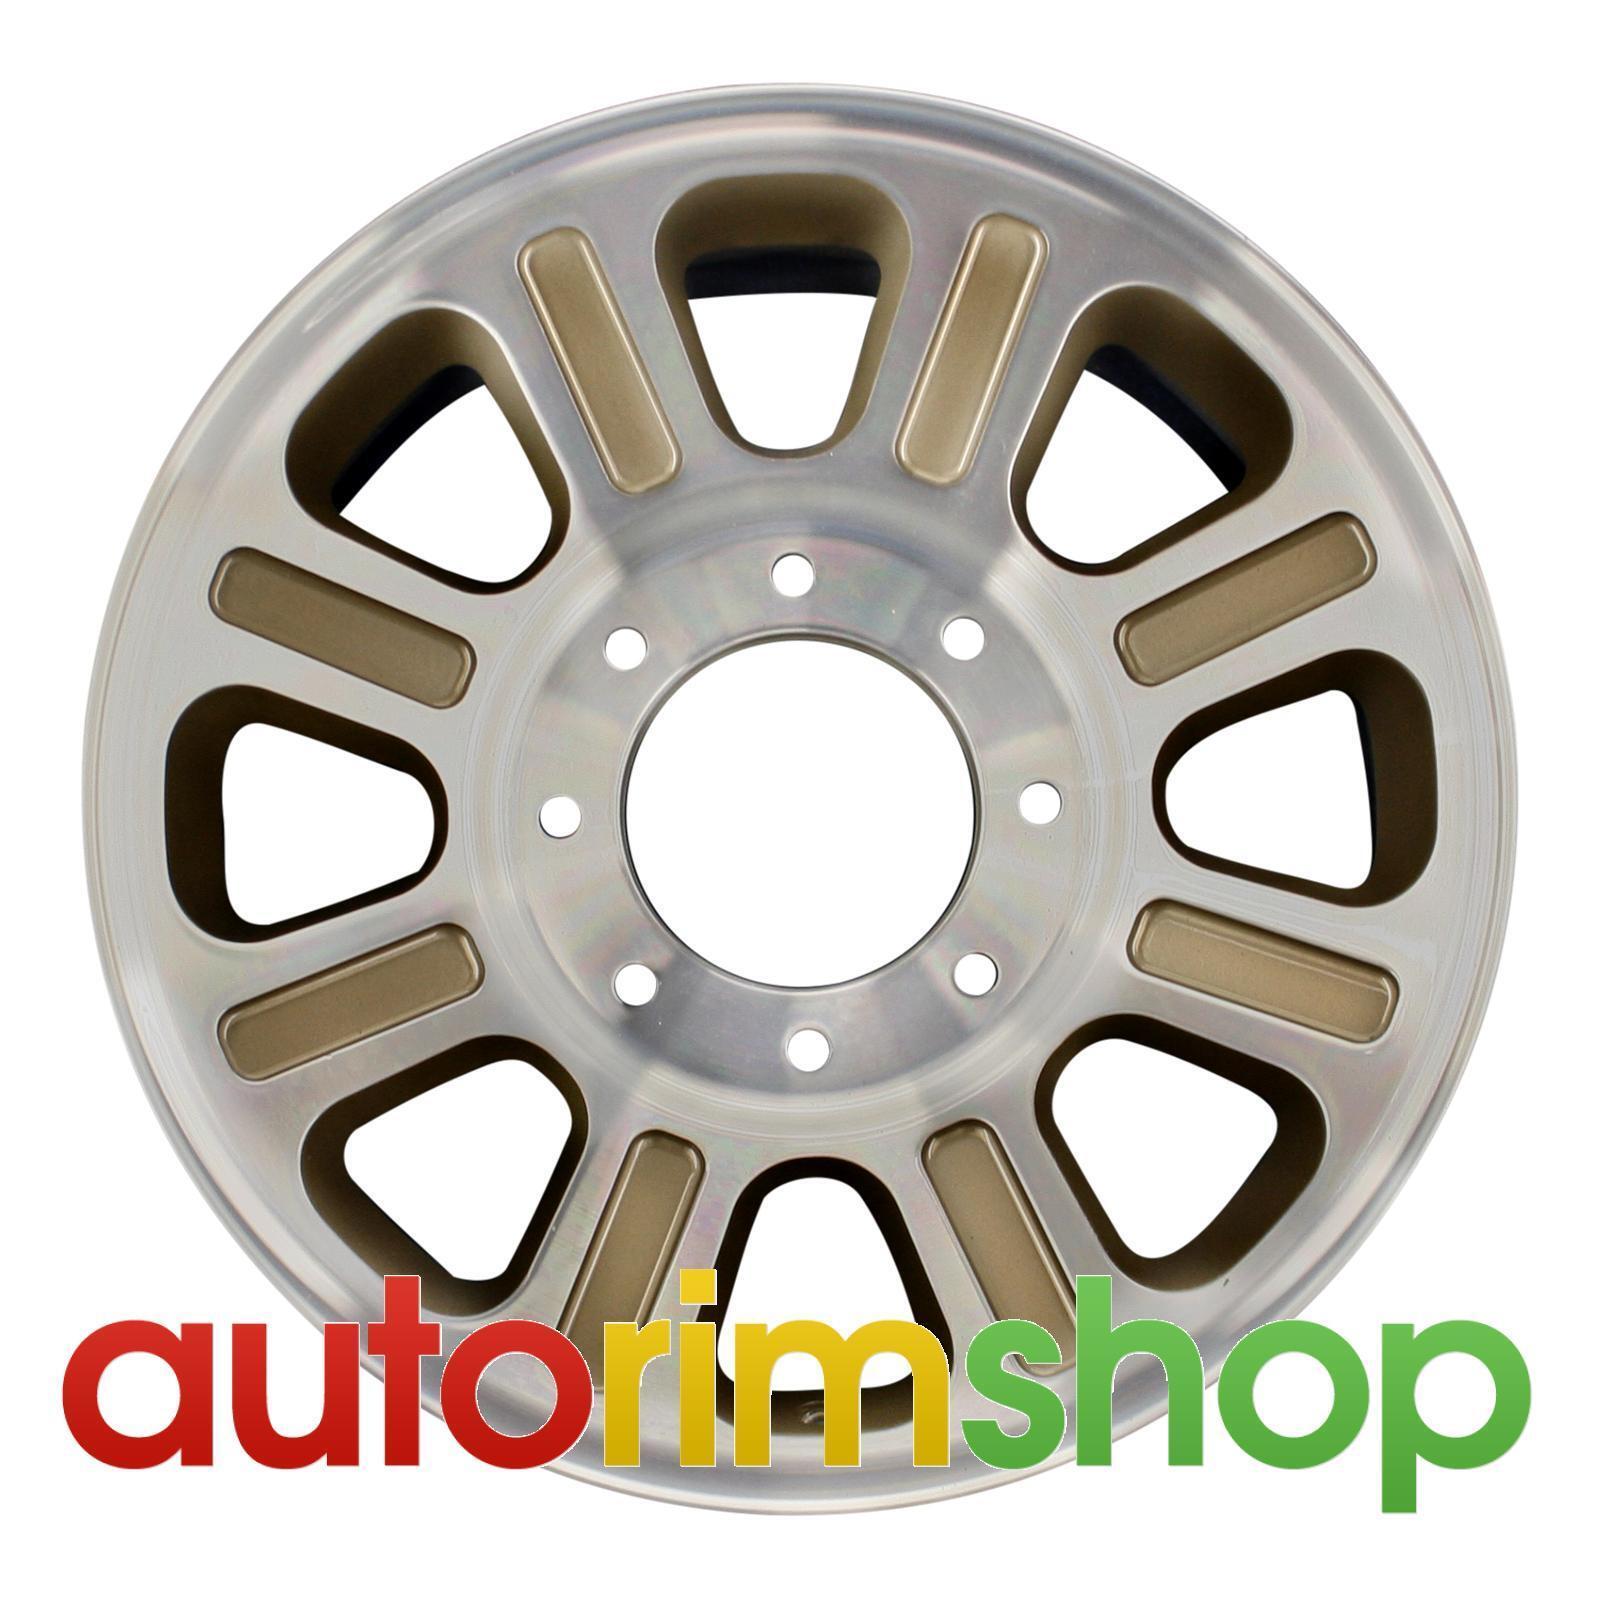 2007 Ford F250 18 Oem Factory Wheel Rim Aly03604u80 For Sale Online Ebay